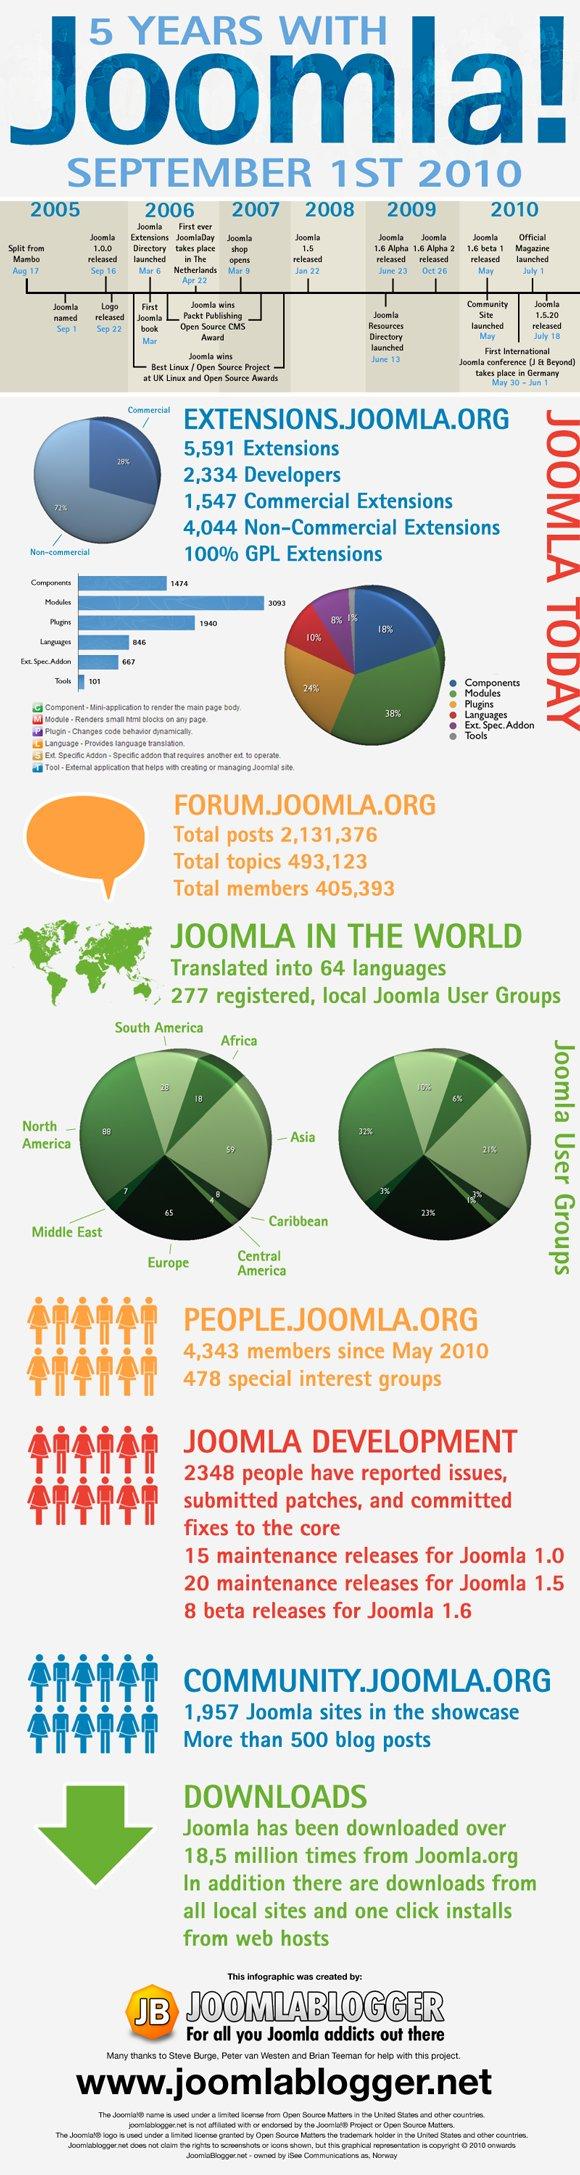 infographie joomla